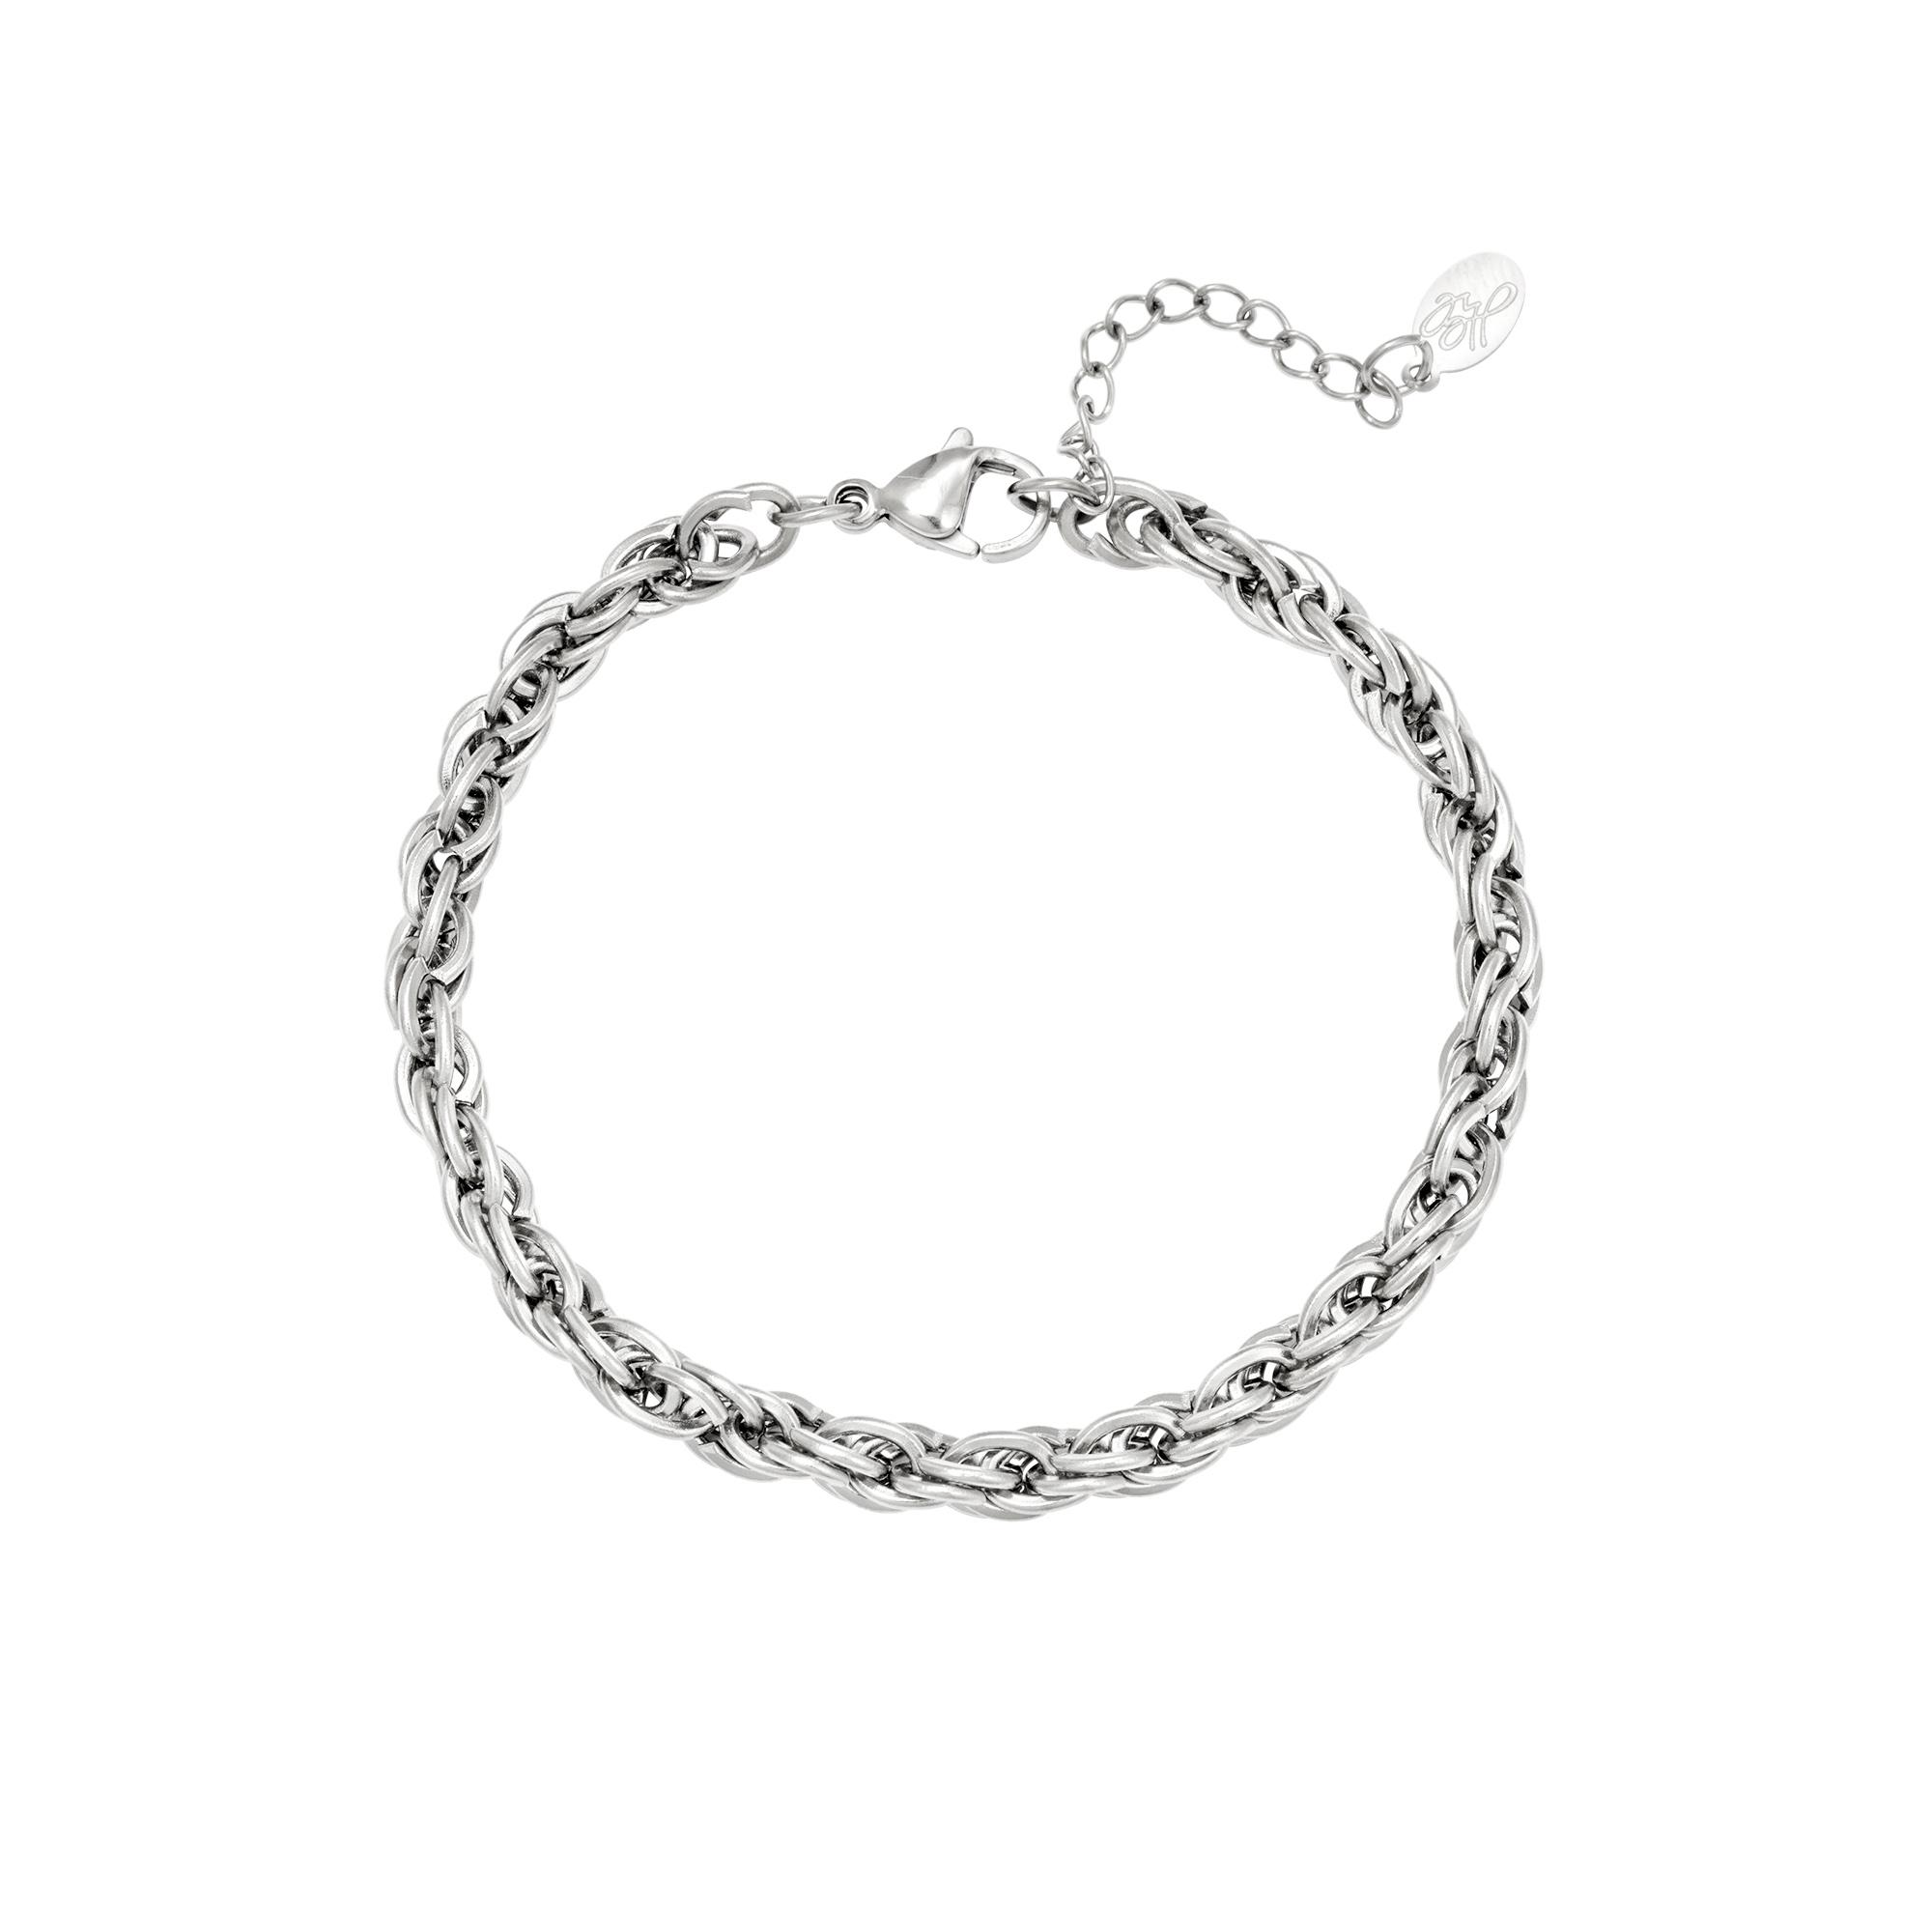 Armband twisted chain